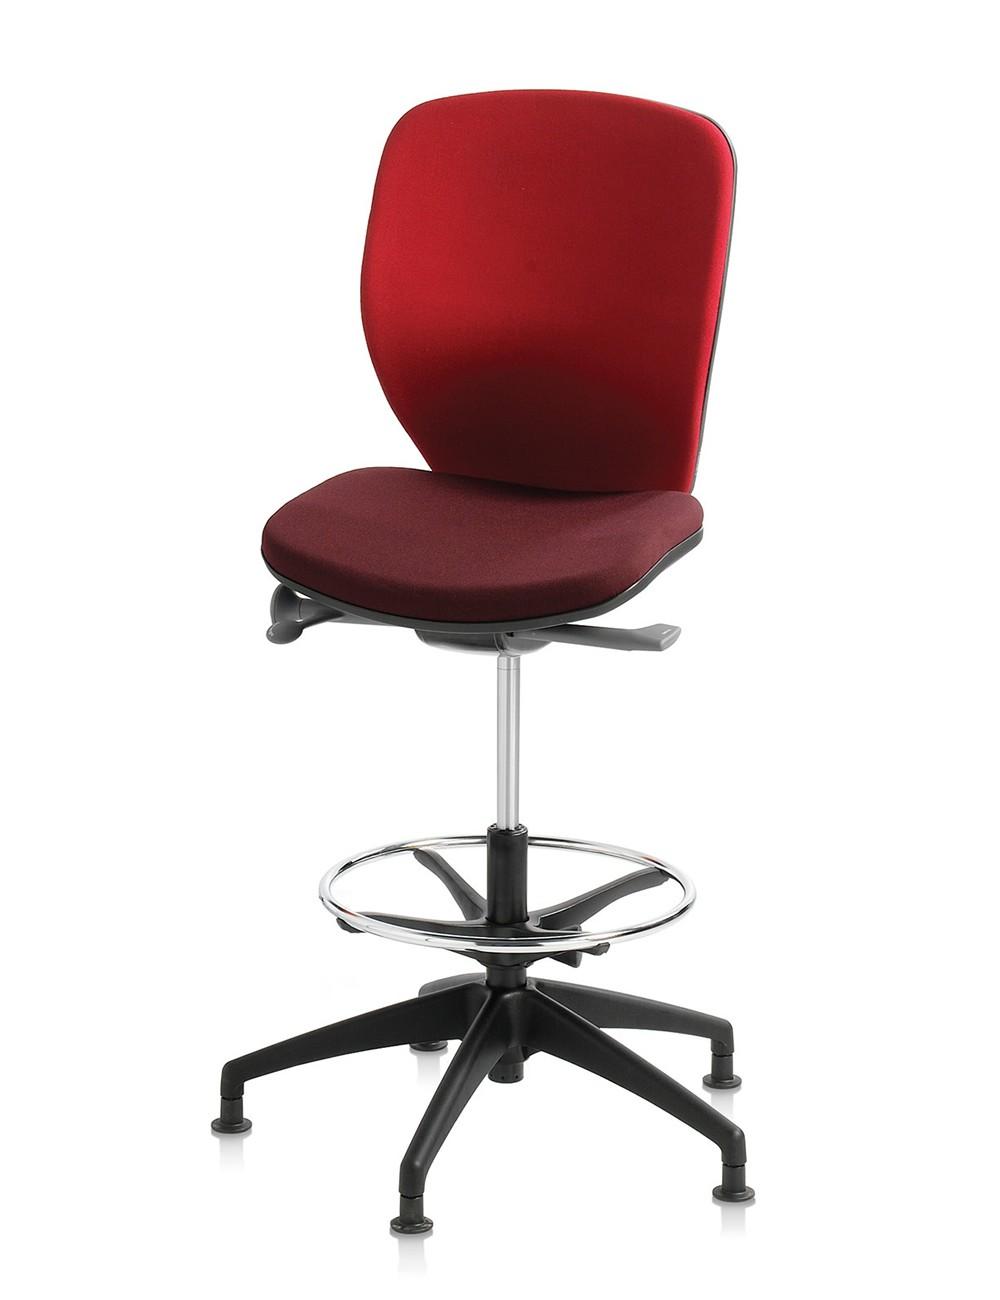 Enjoyable Orangebox Joy Counter Height Office Chair No Arms Inzonedesignstudio Interior Chair Design Inzonedesignstudiocom